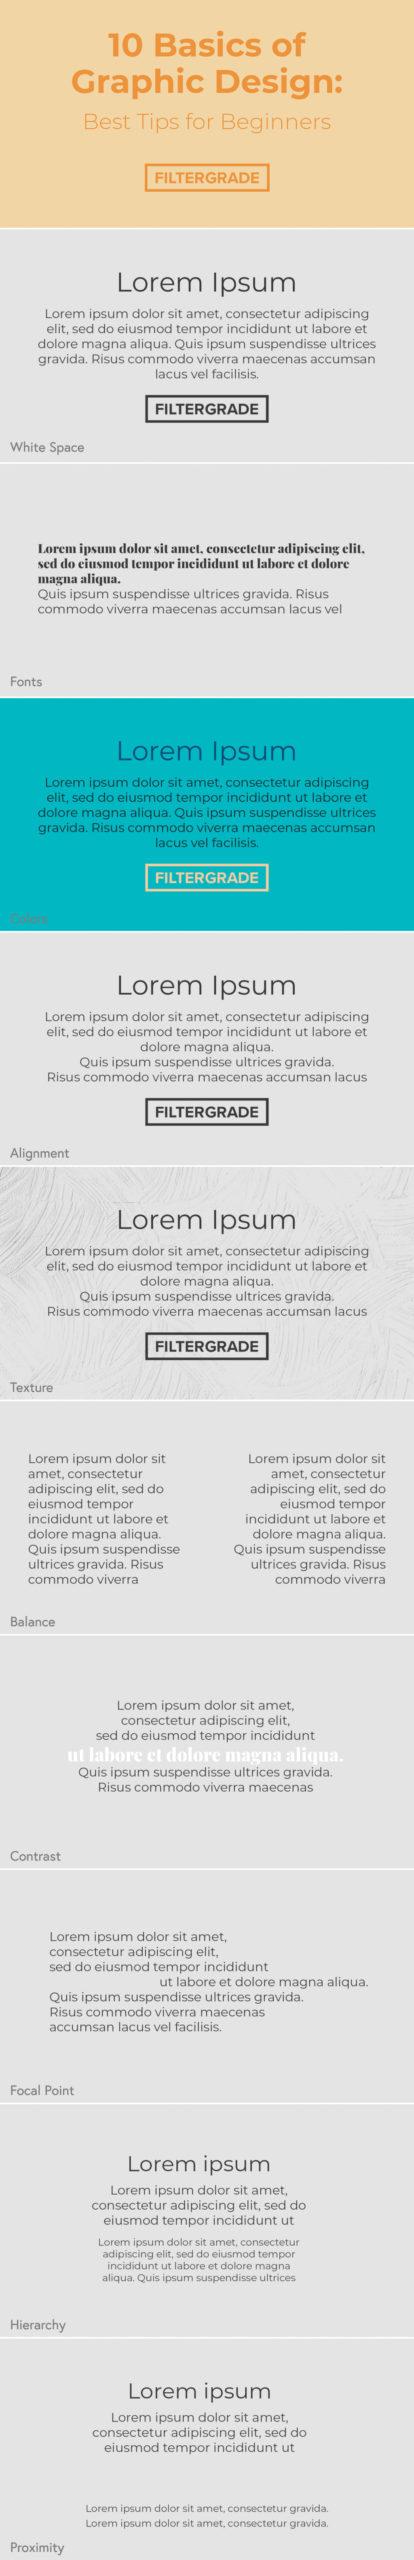 Basics of Graphic Design Infographic